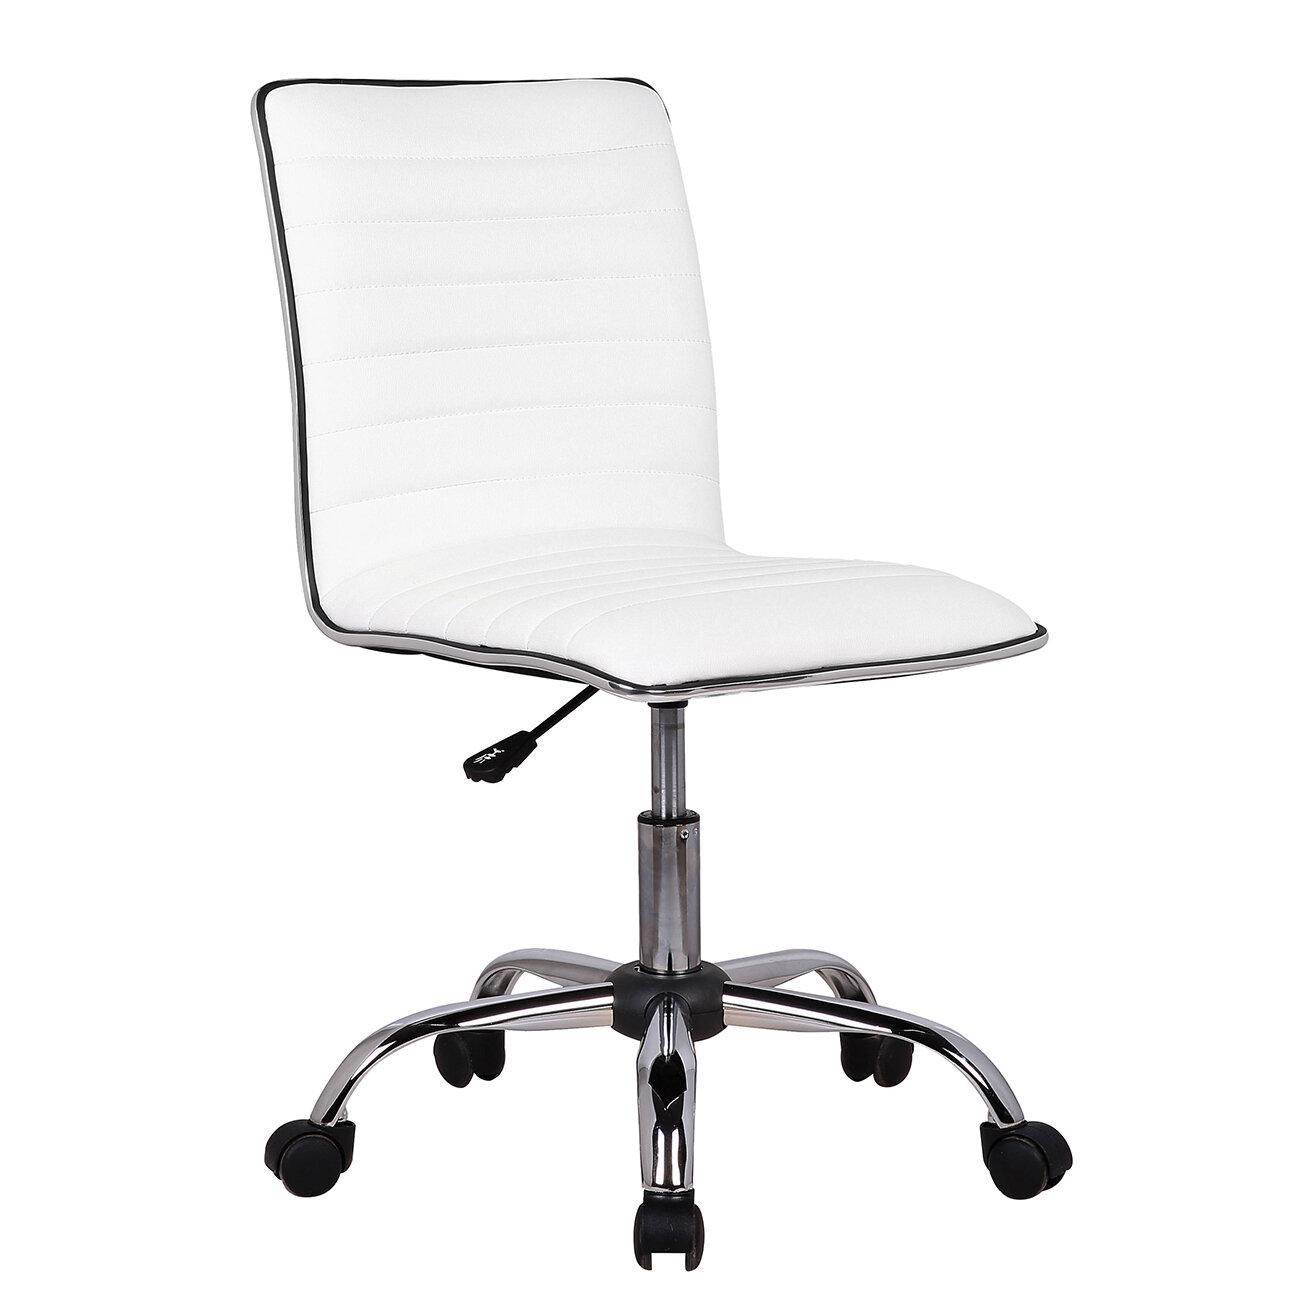 Ordinaire Orren Ellis Fabricio Adjustable Modern Swivel Desk Chair U0026 Reviews | Wayfair